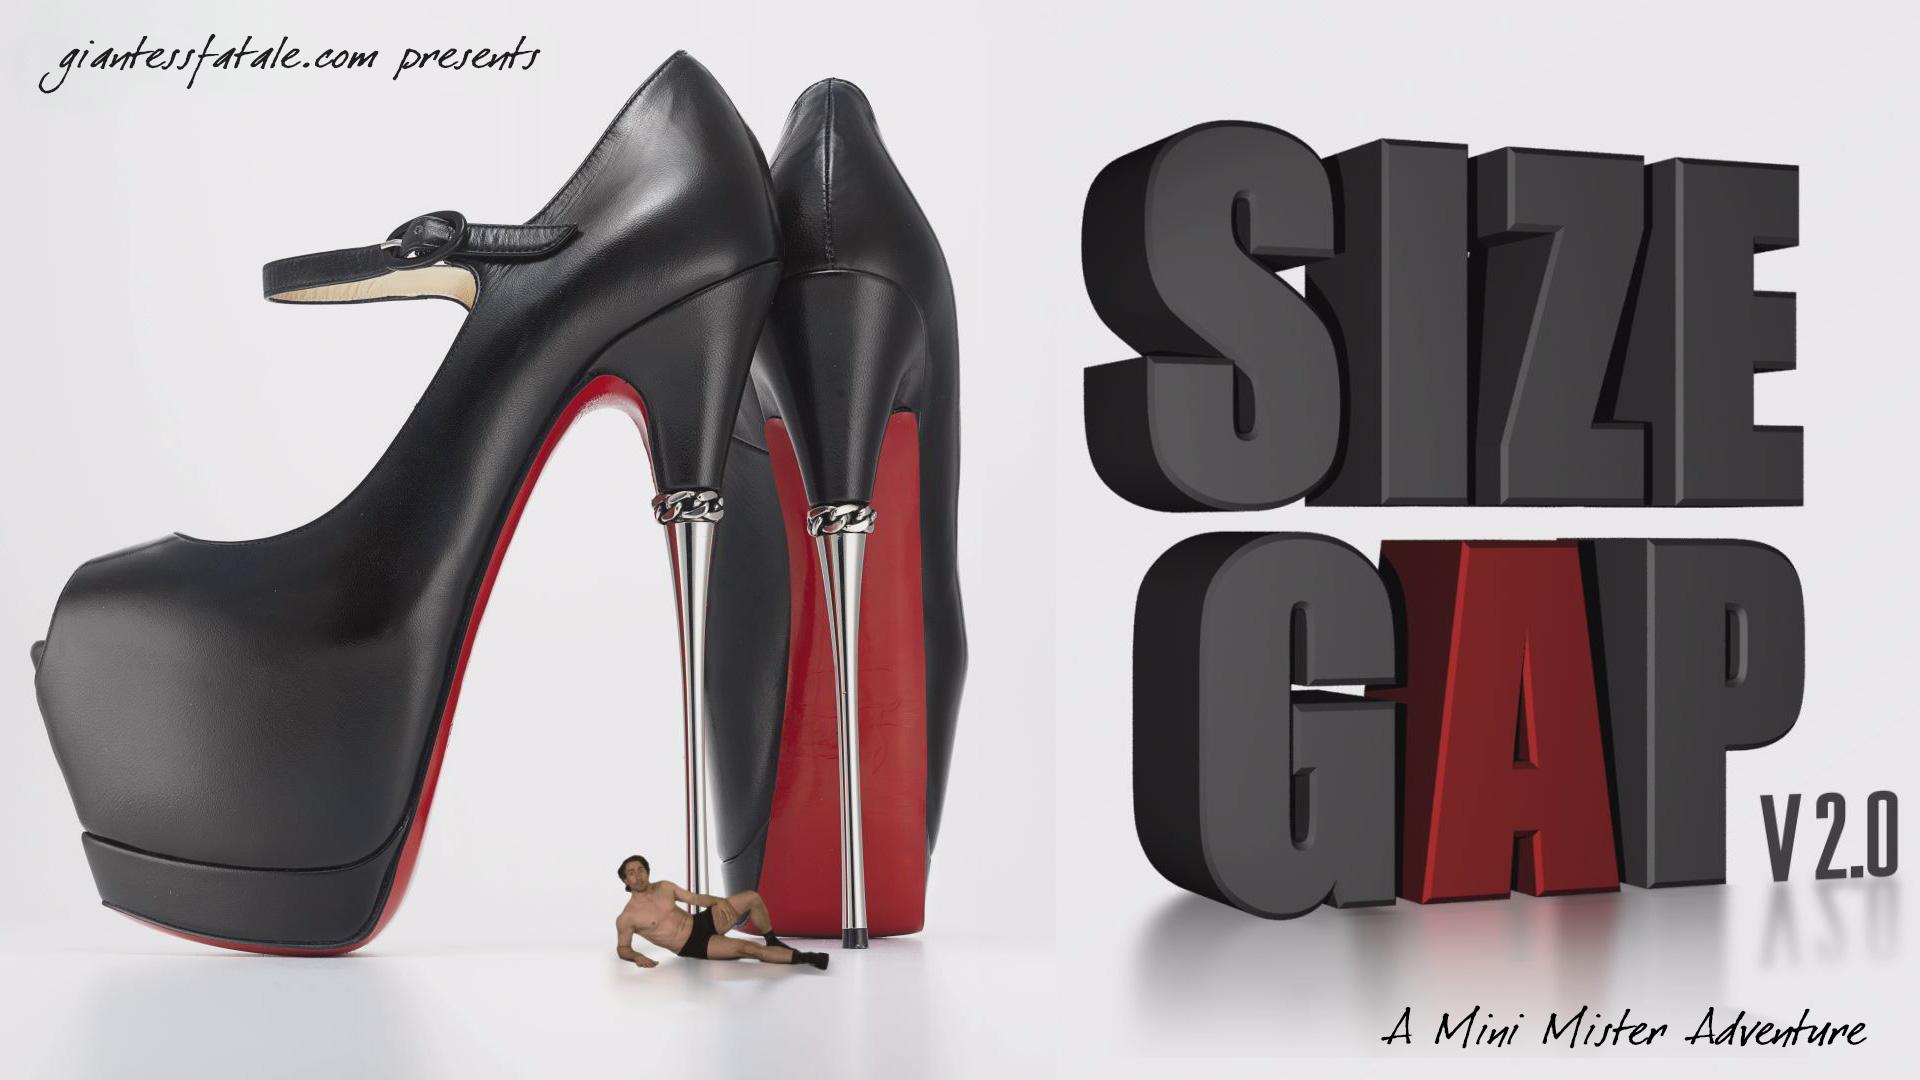 Size Gap V2.0 Poster